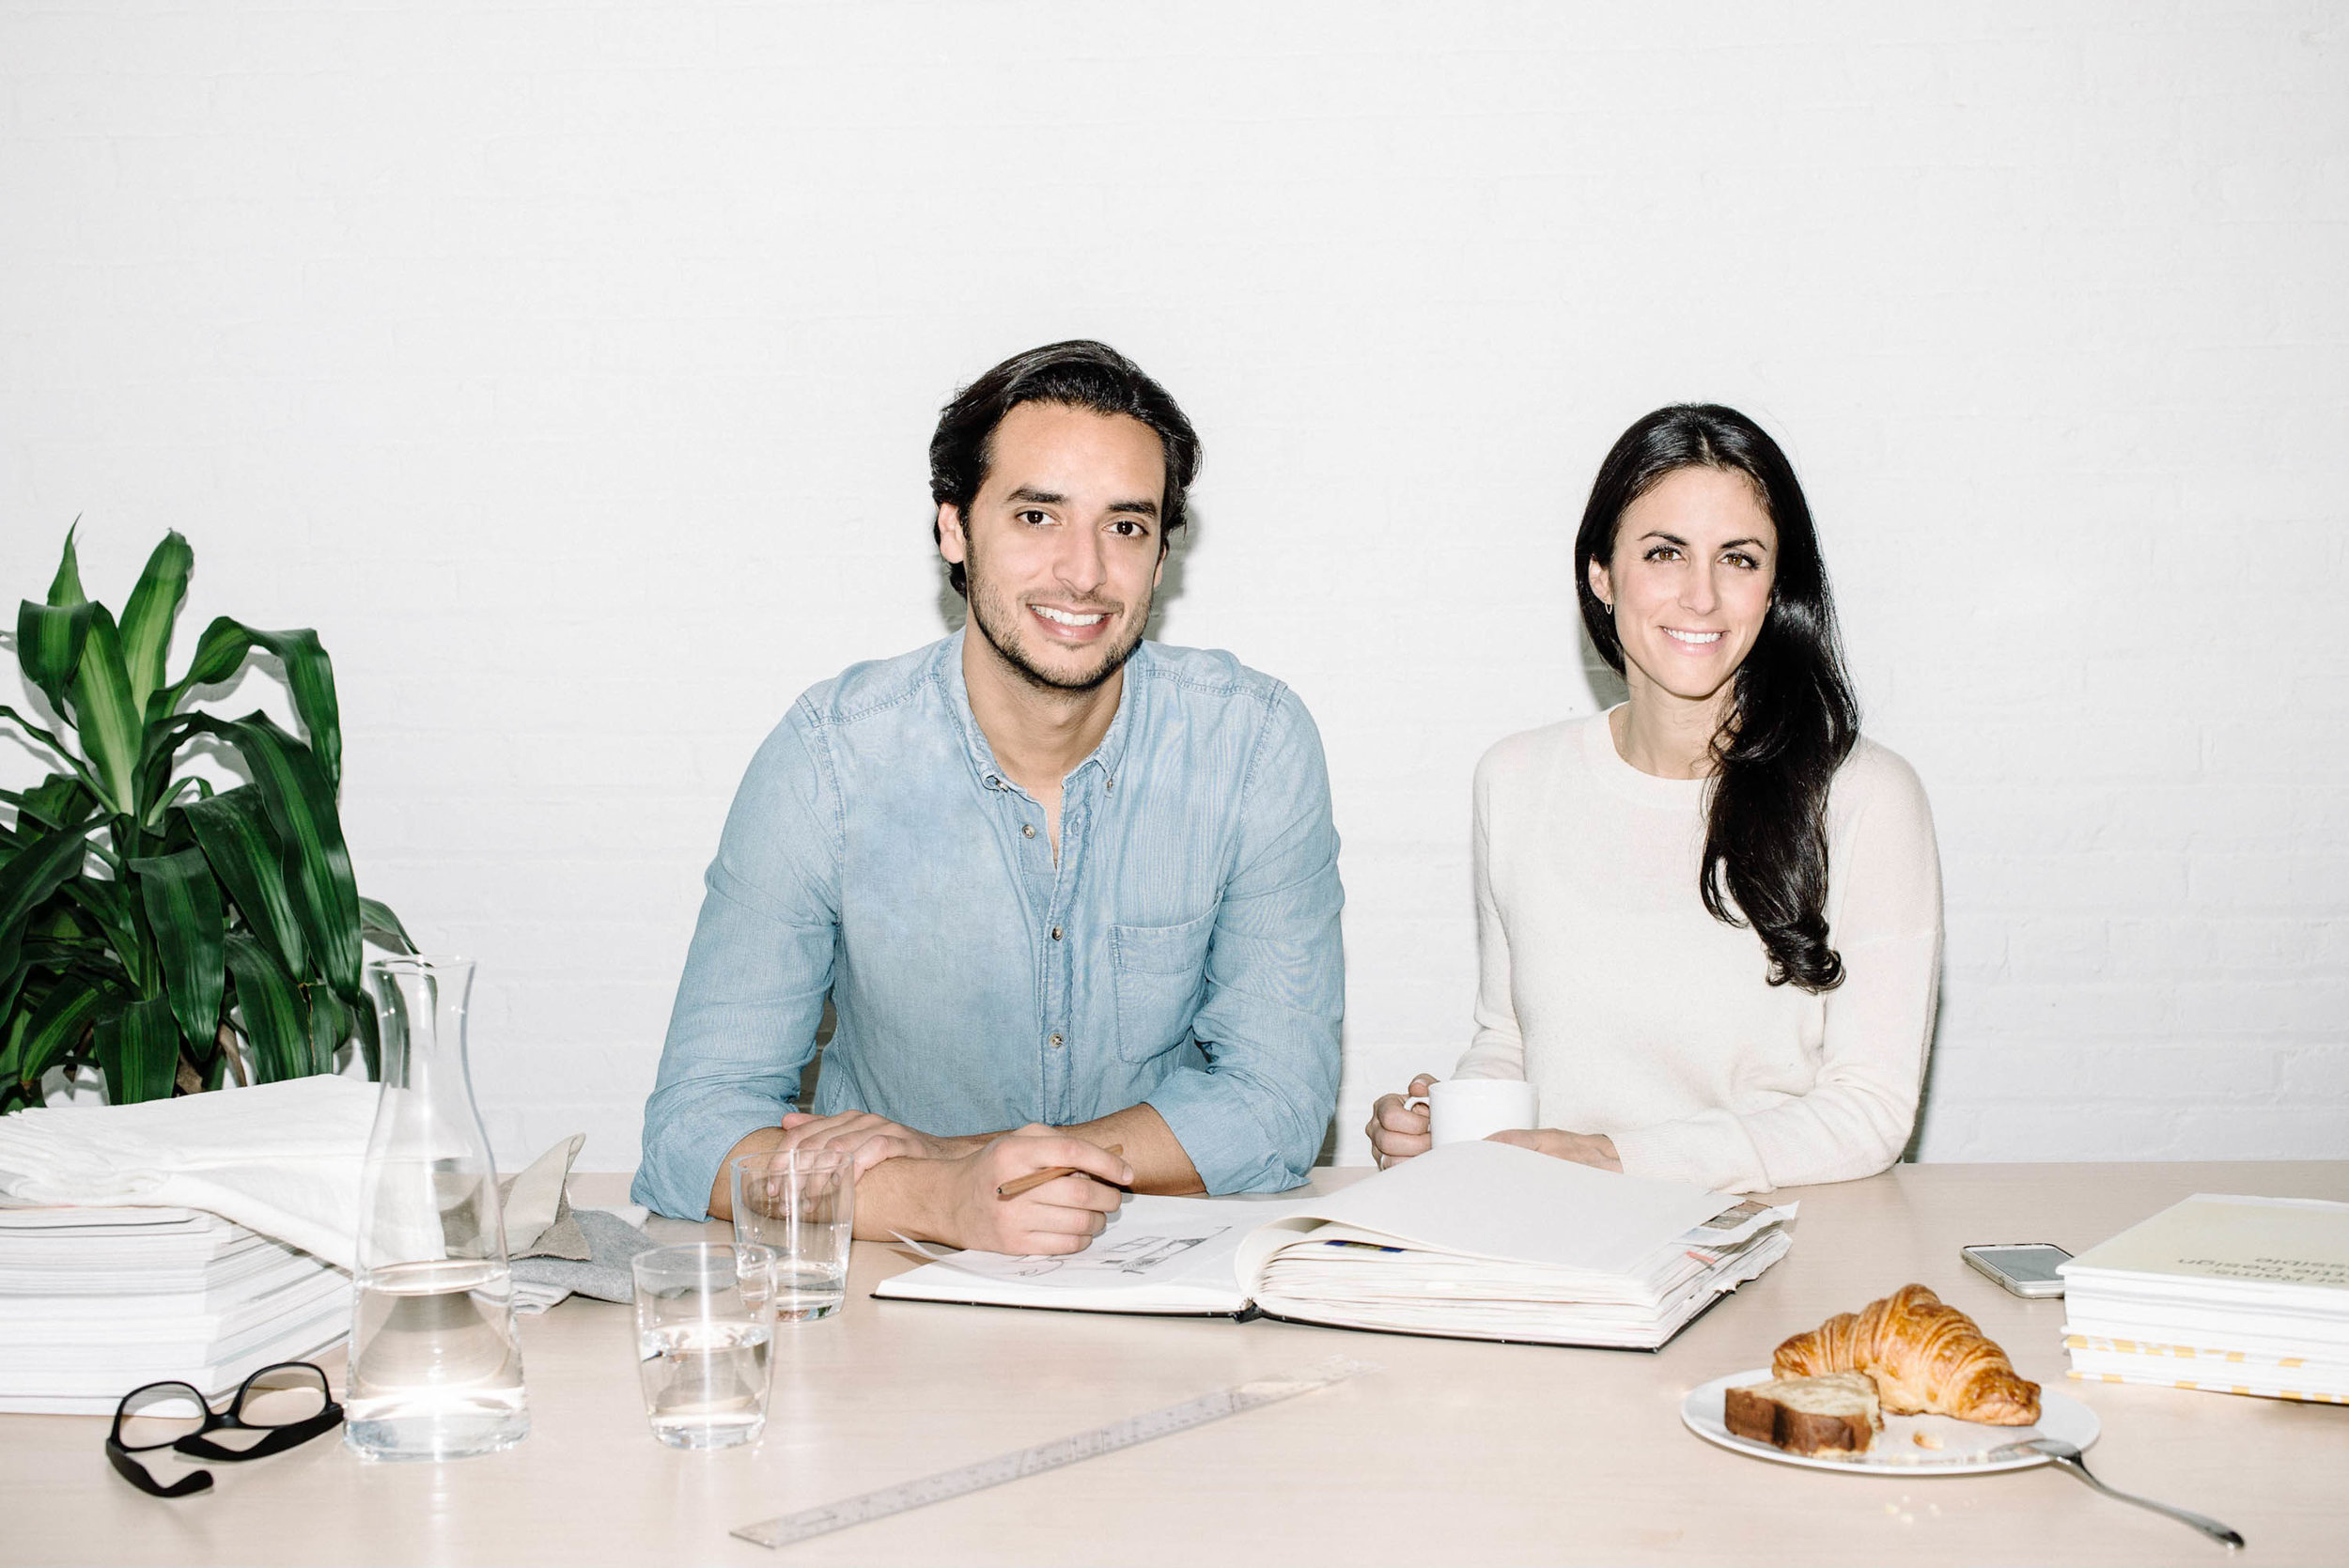 Snowe-Founders-Andres-Modak-and-Rachel-Cohen-2.jpg